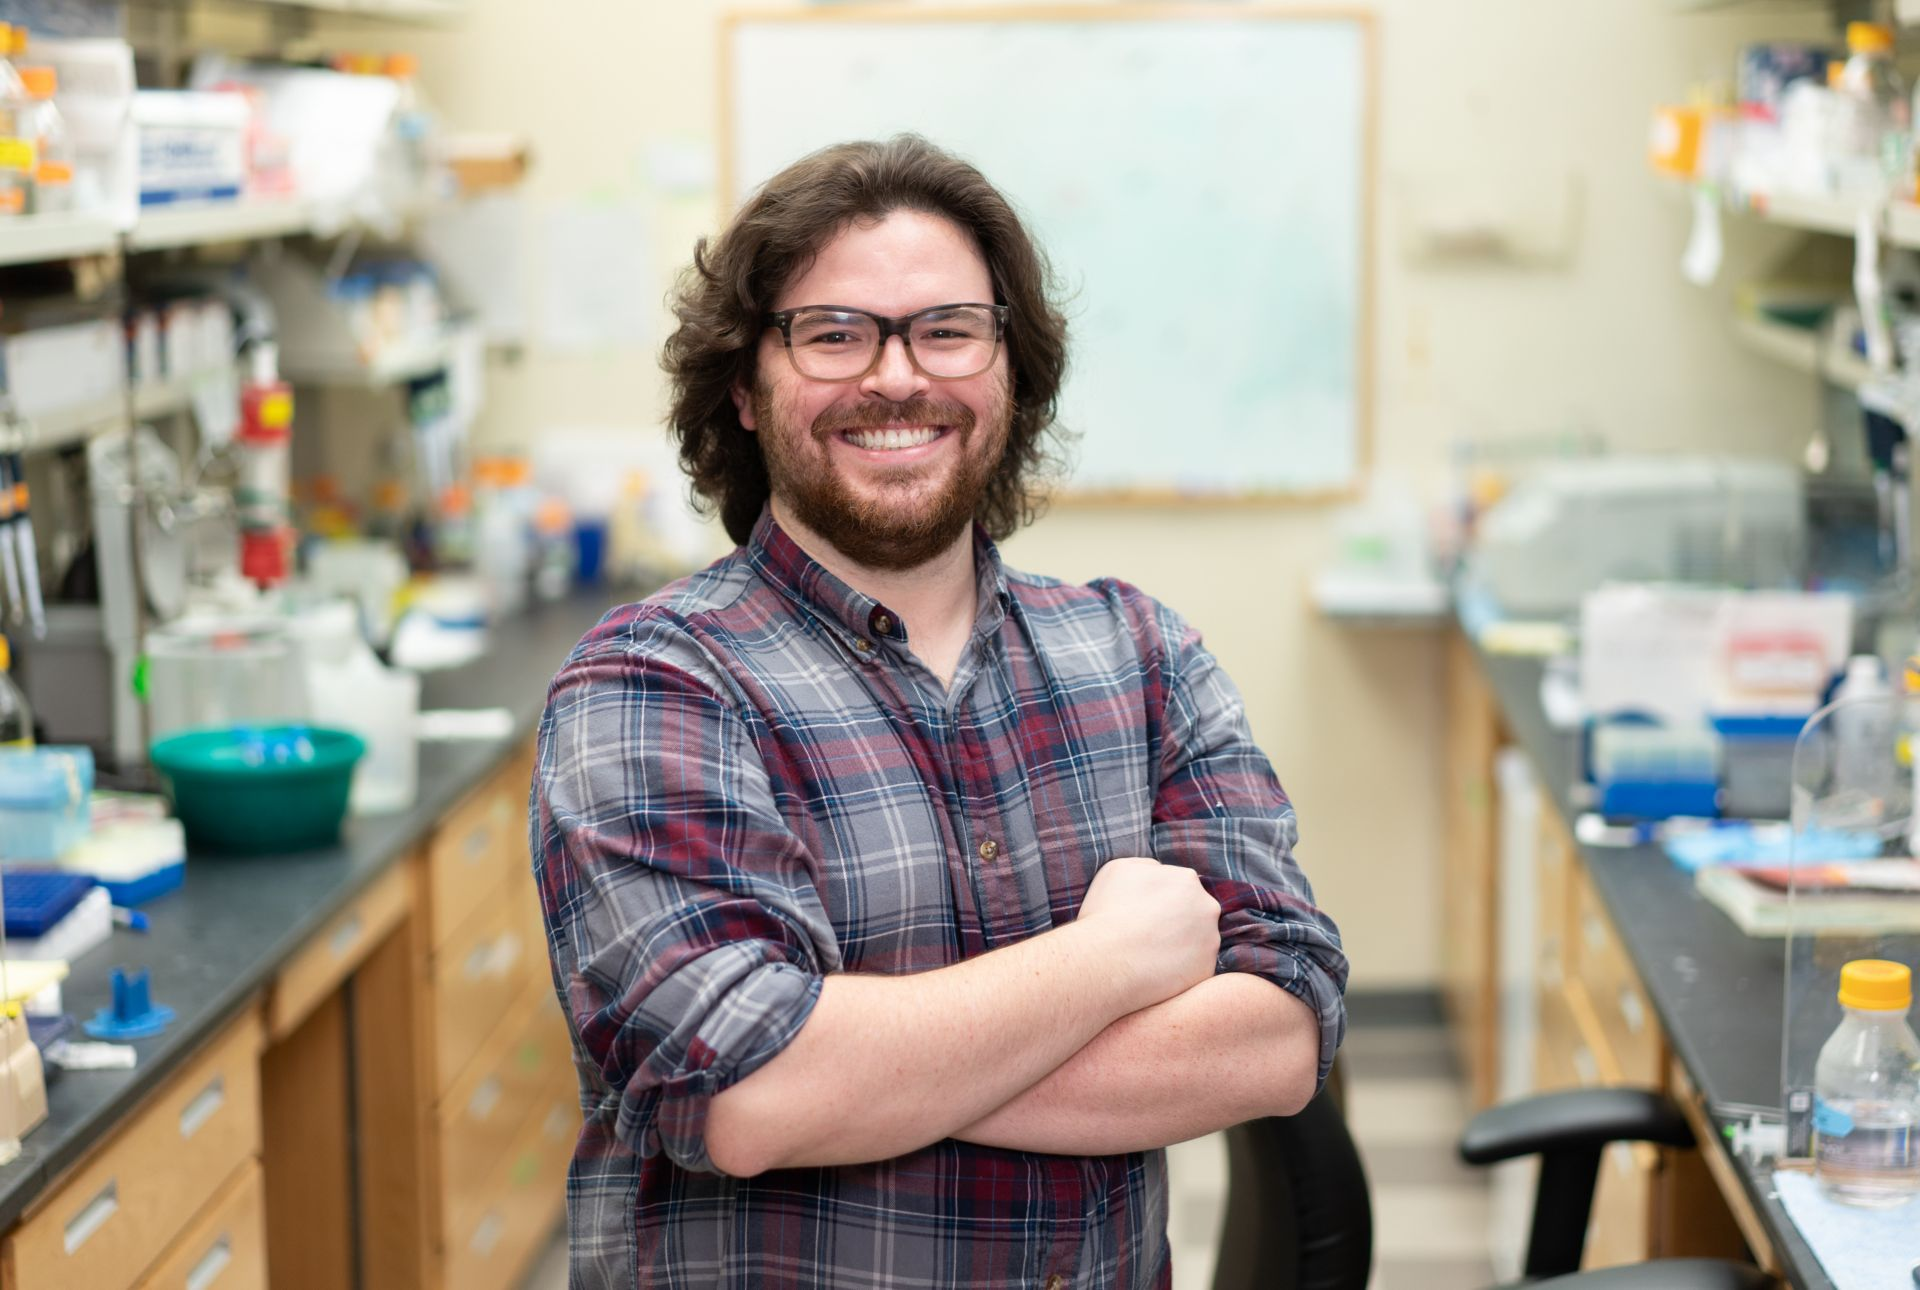 Scott Gorman, PhD